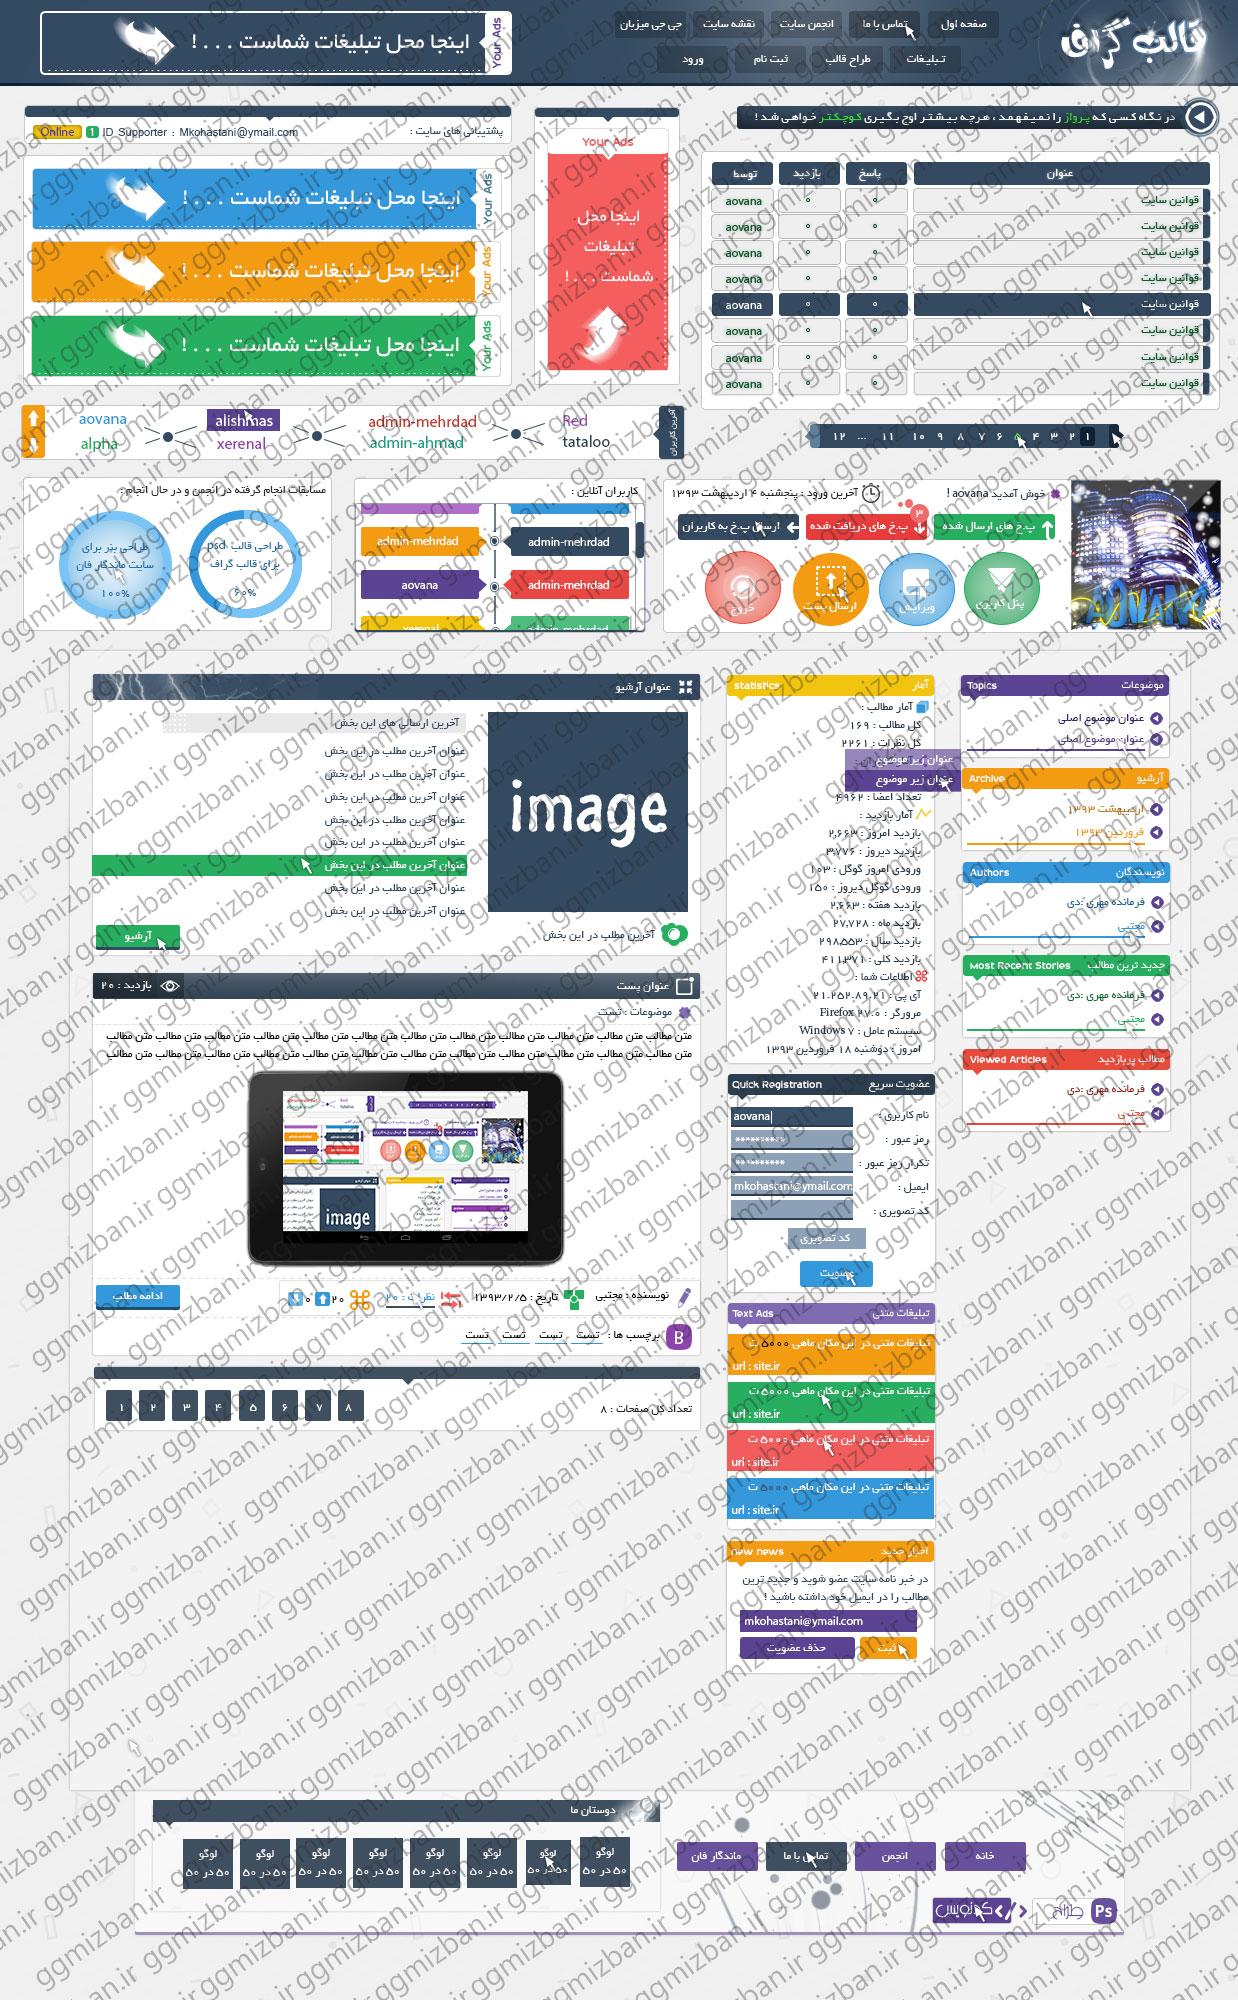 http://up.ghalebgraph.ir/up/galebgraph/ggmizban/designers_work/aovana/psd_theme/4.jpg